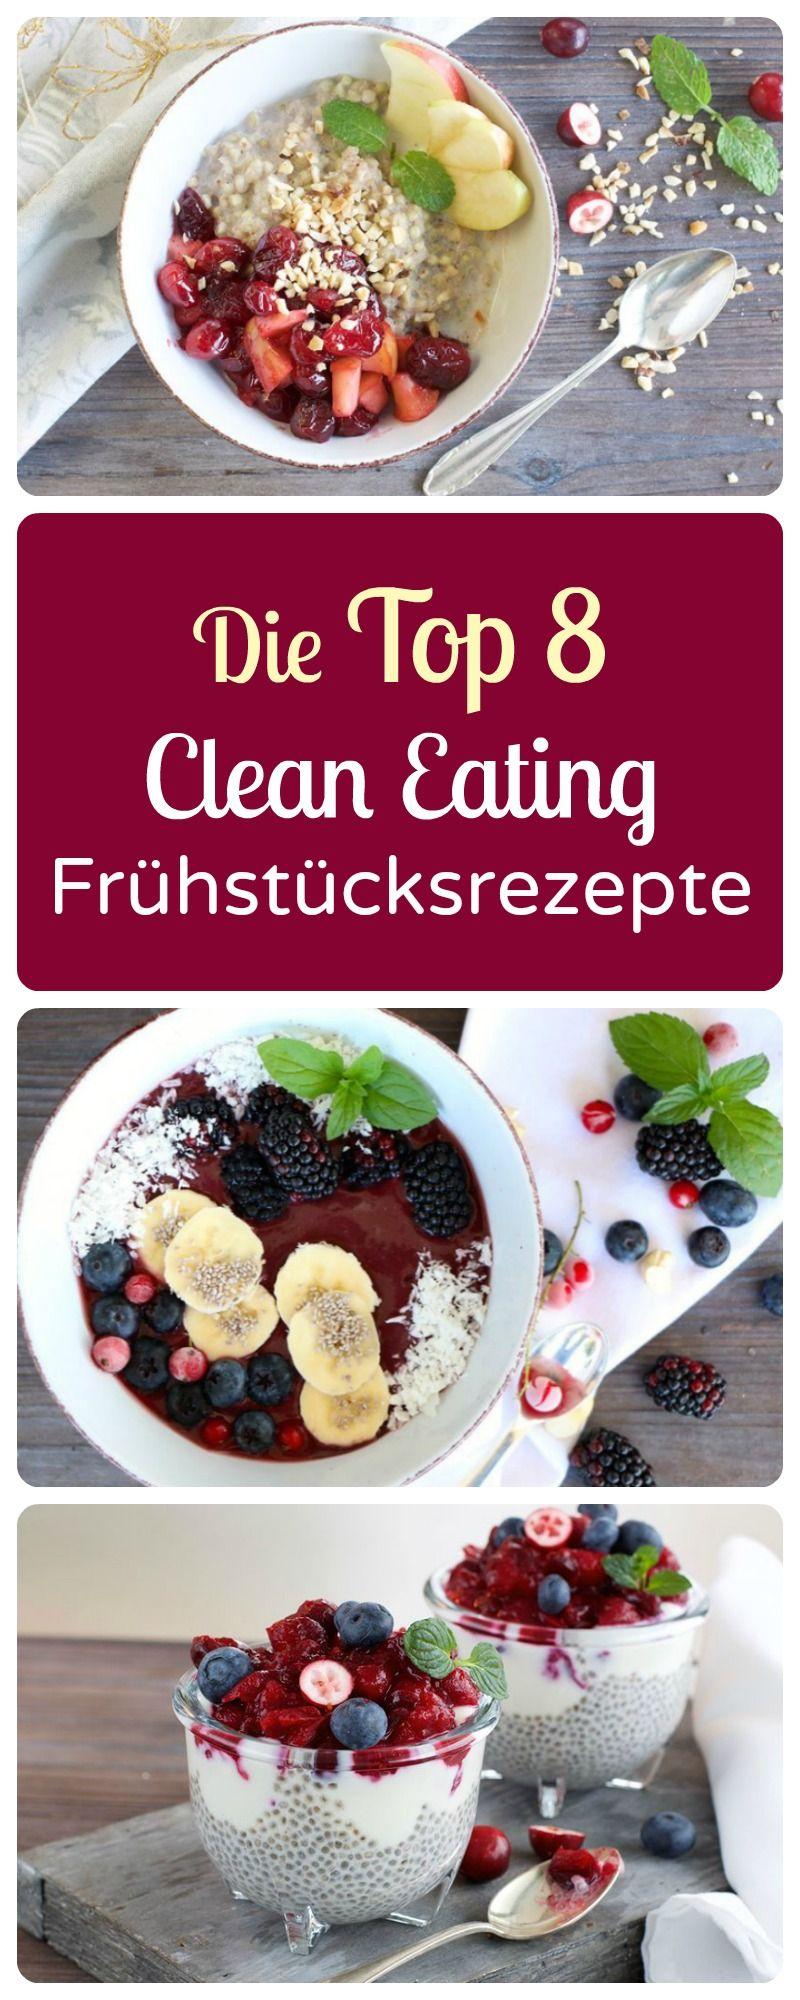 15 Clean Eating Frühstücks-Rezepte -   25 fitness food rezepte ideas